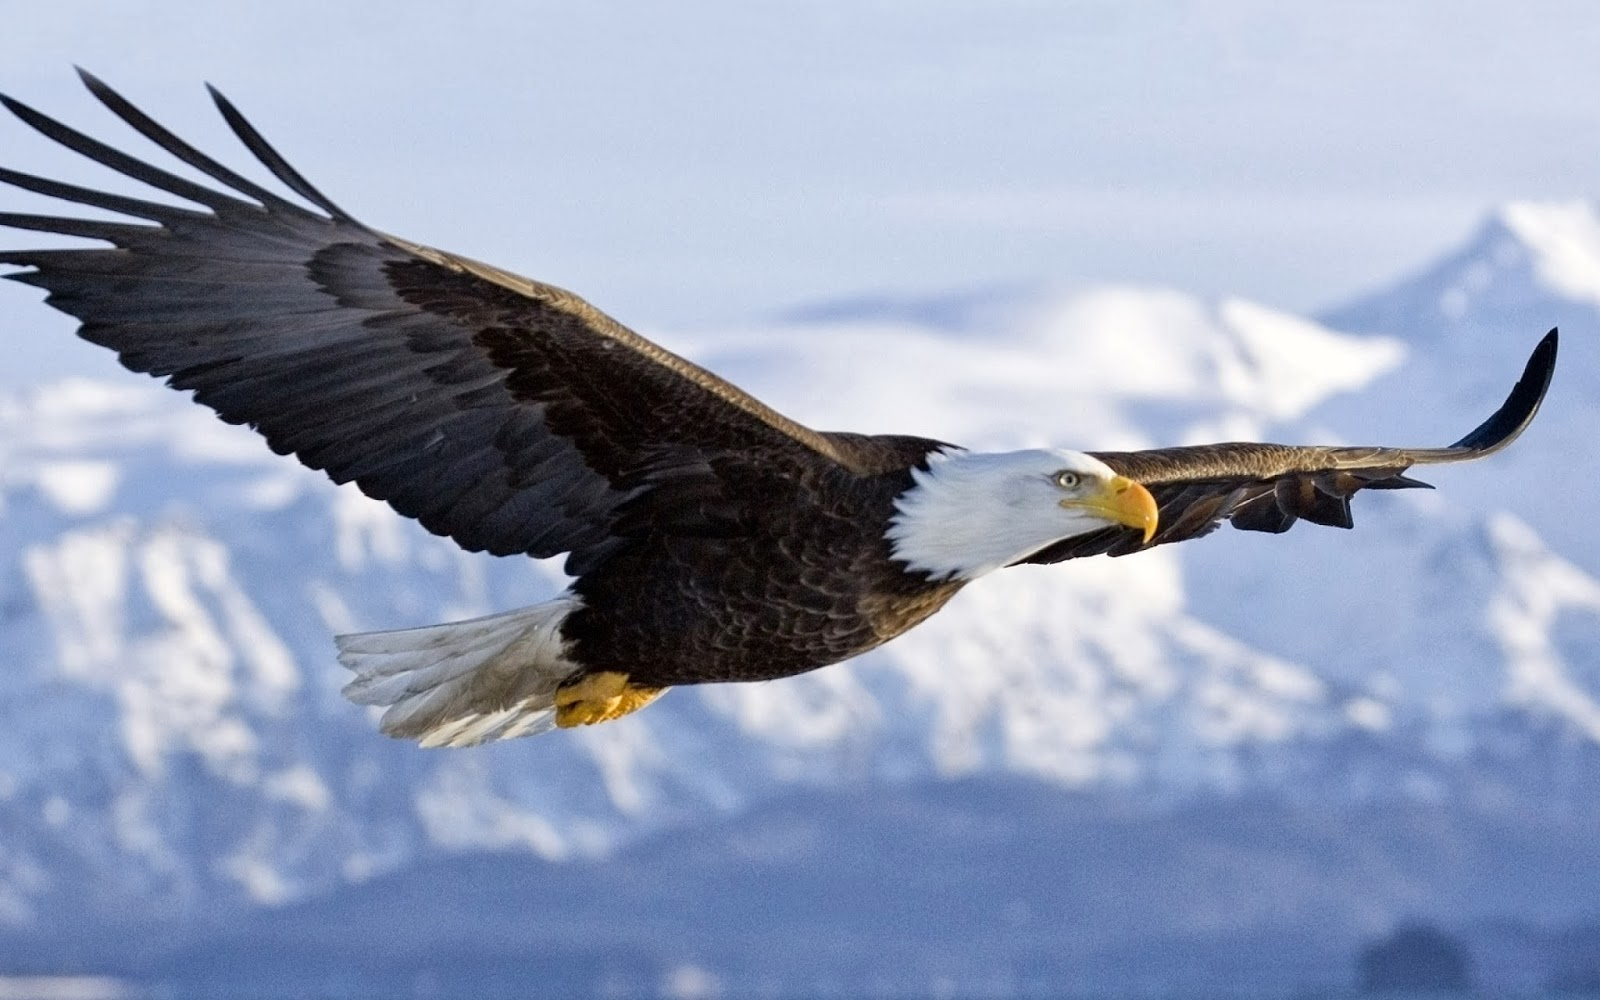 Popular   Wallpaper Horse Eagle - computer-animal-eagle-wallpaper-free-download-e  2018_573199.jpg